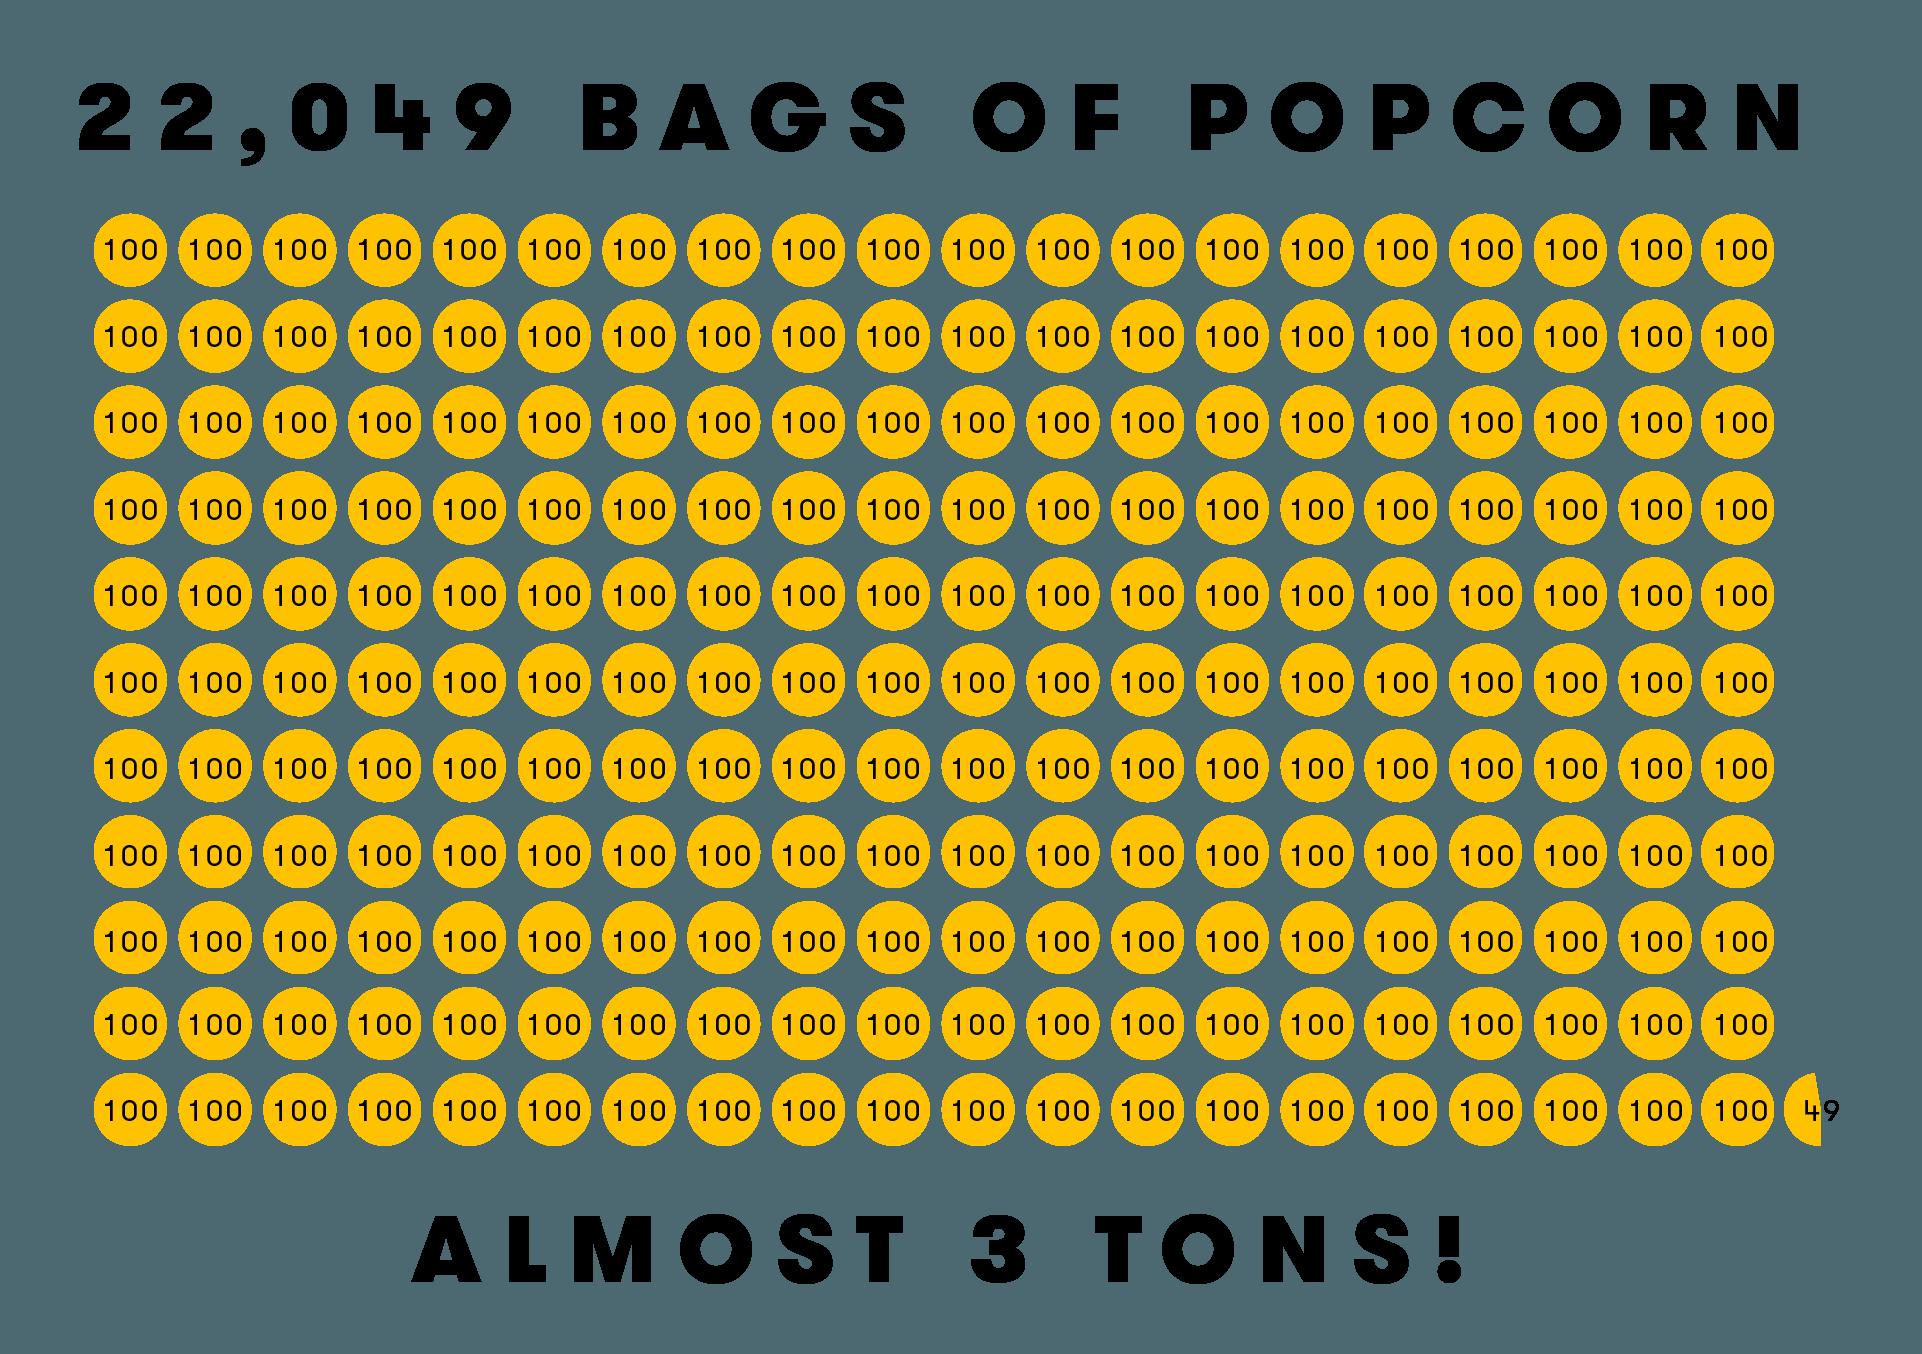 popcorn@2x-8.png